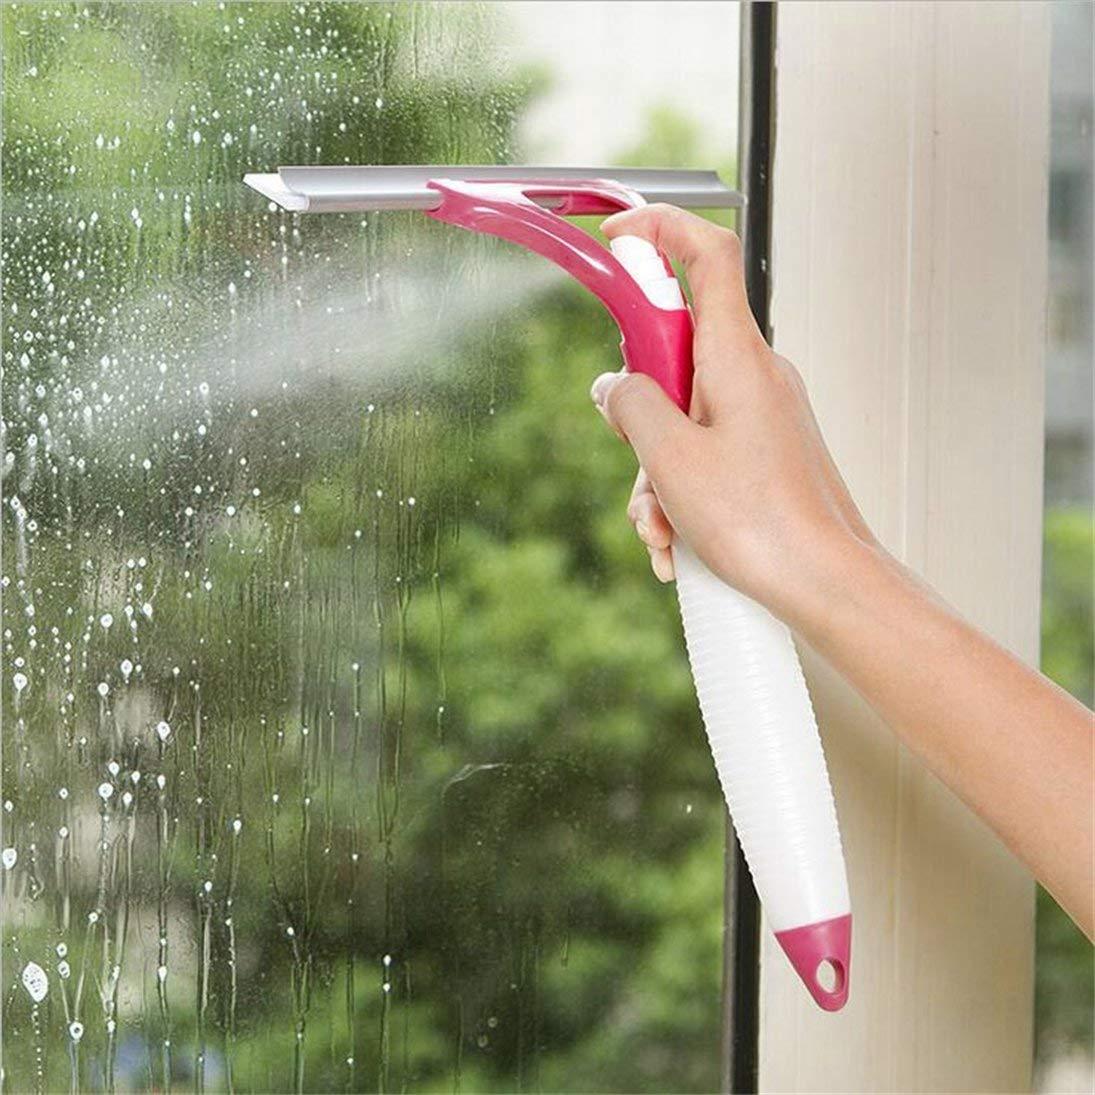 Mampara de ducha limpia de la cuchilla de limpieza del limpiaparabrisas del parabrisas del coche del espejo de la ventana